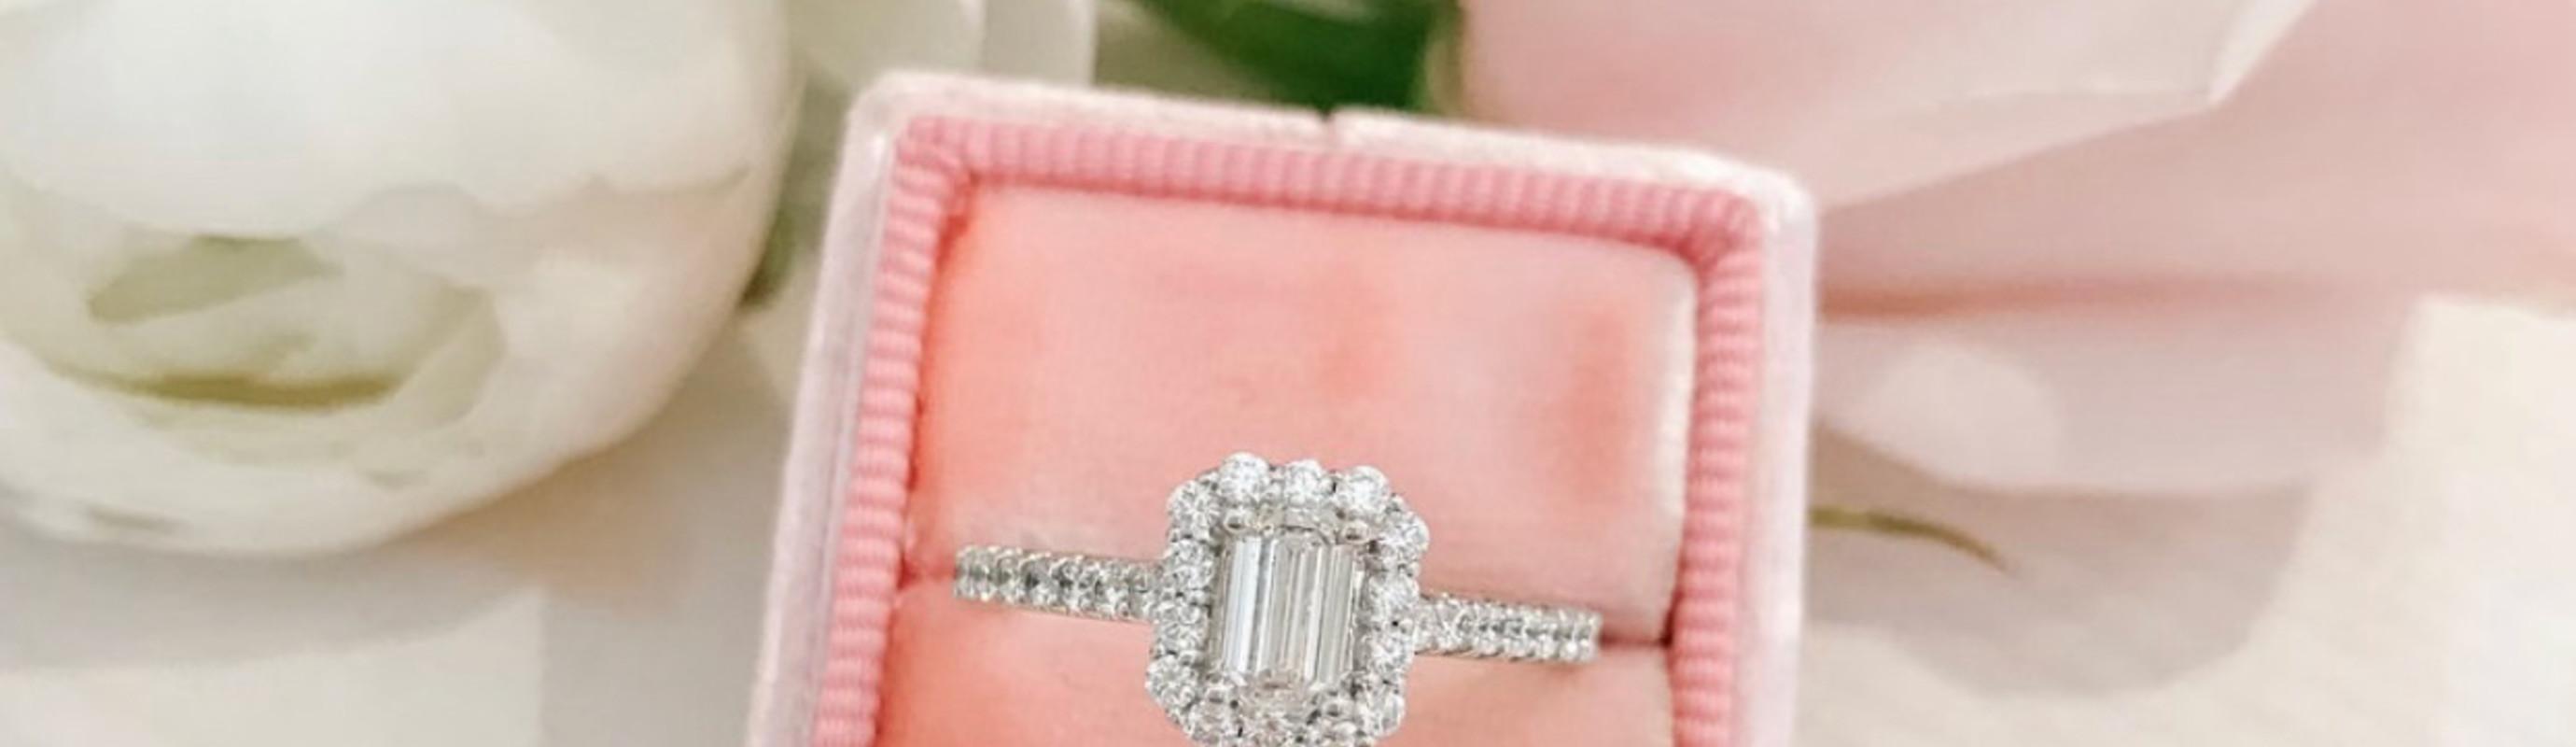 The elegant emerald cut